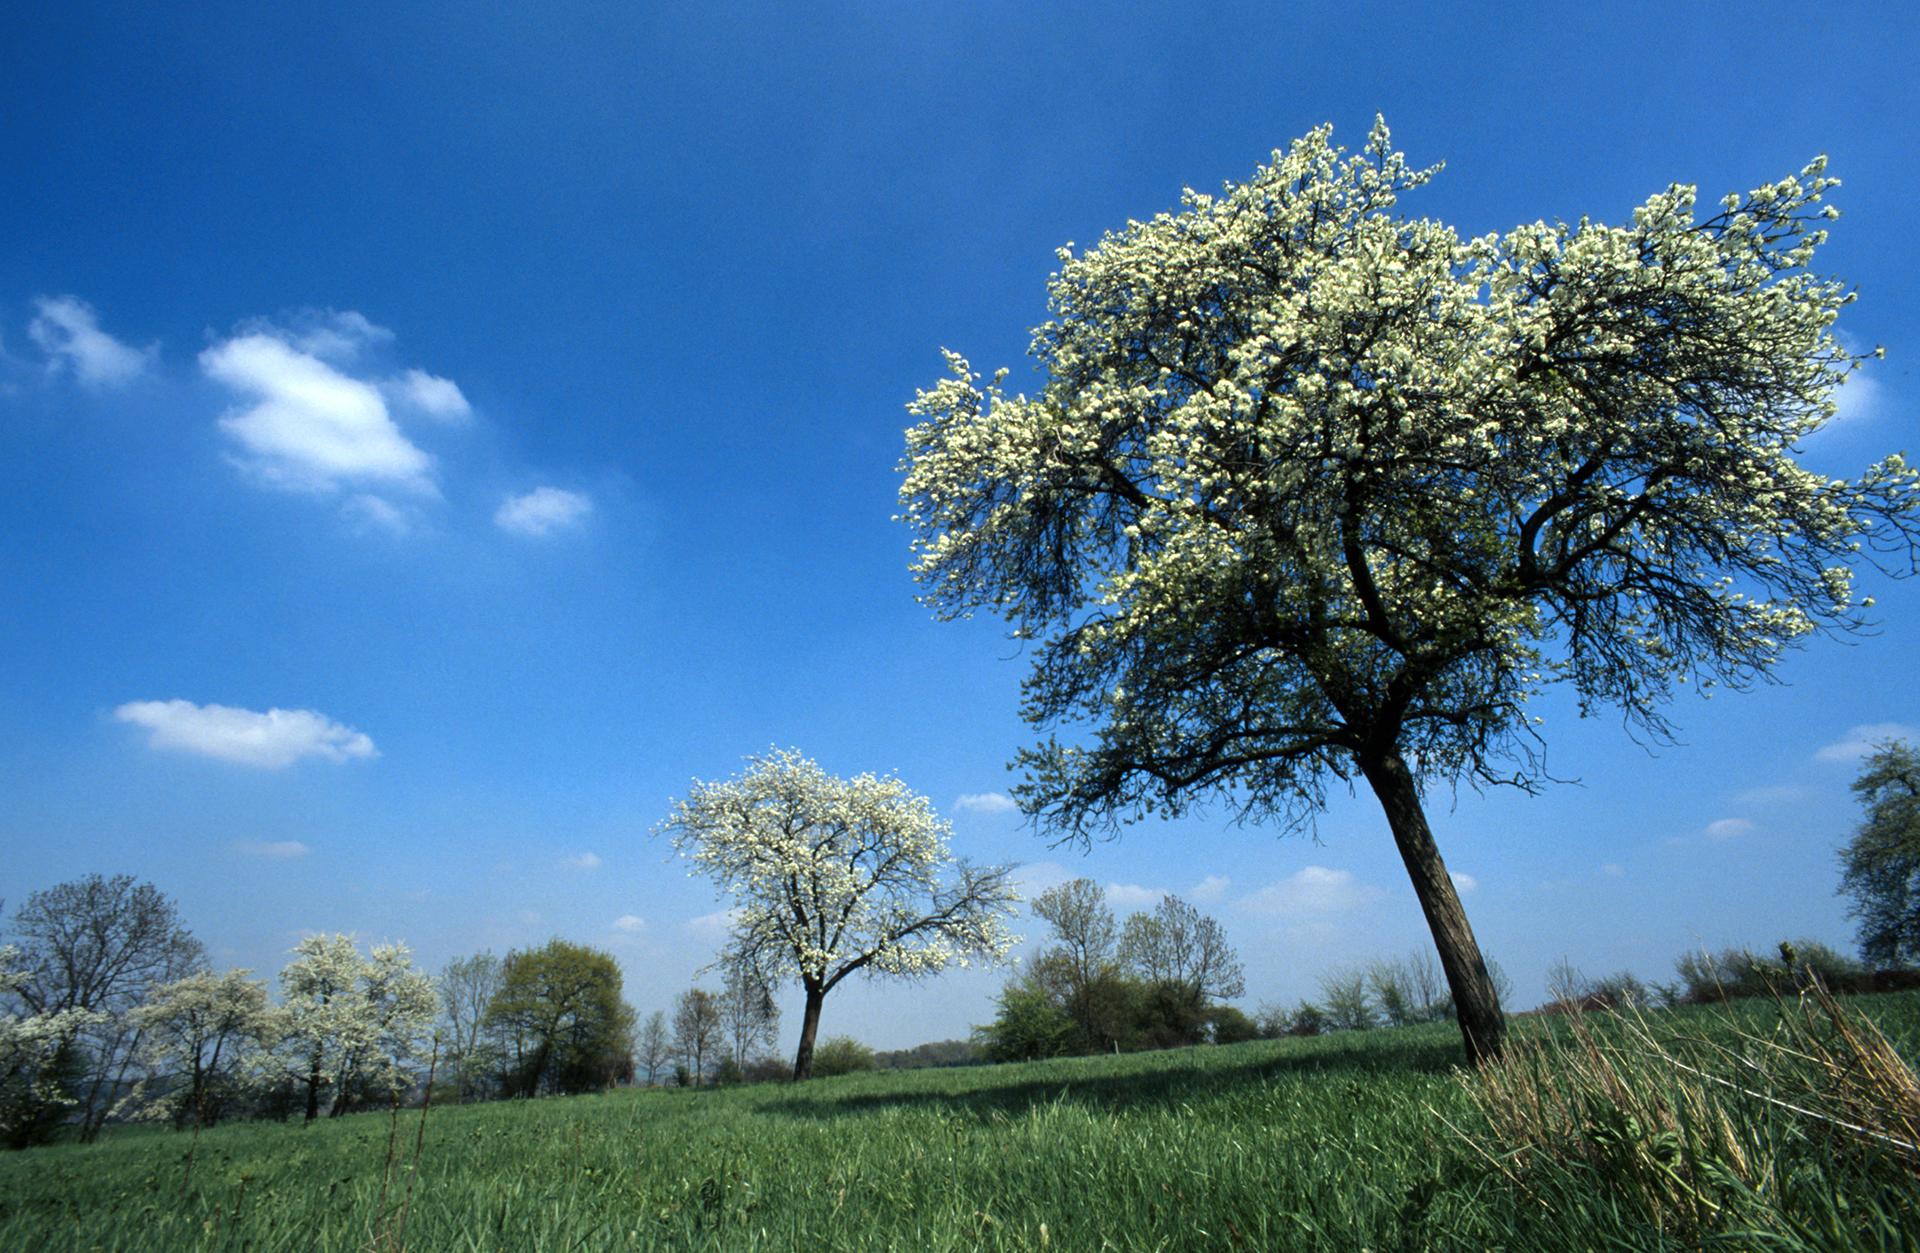 Pays de Herve - Paysage , Pays de Herve - Paysage